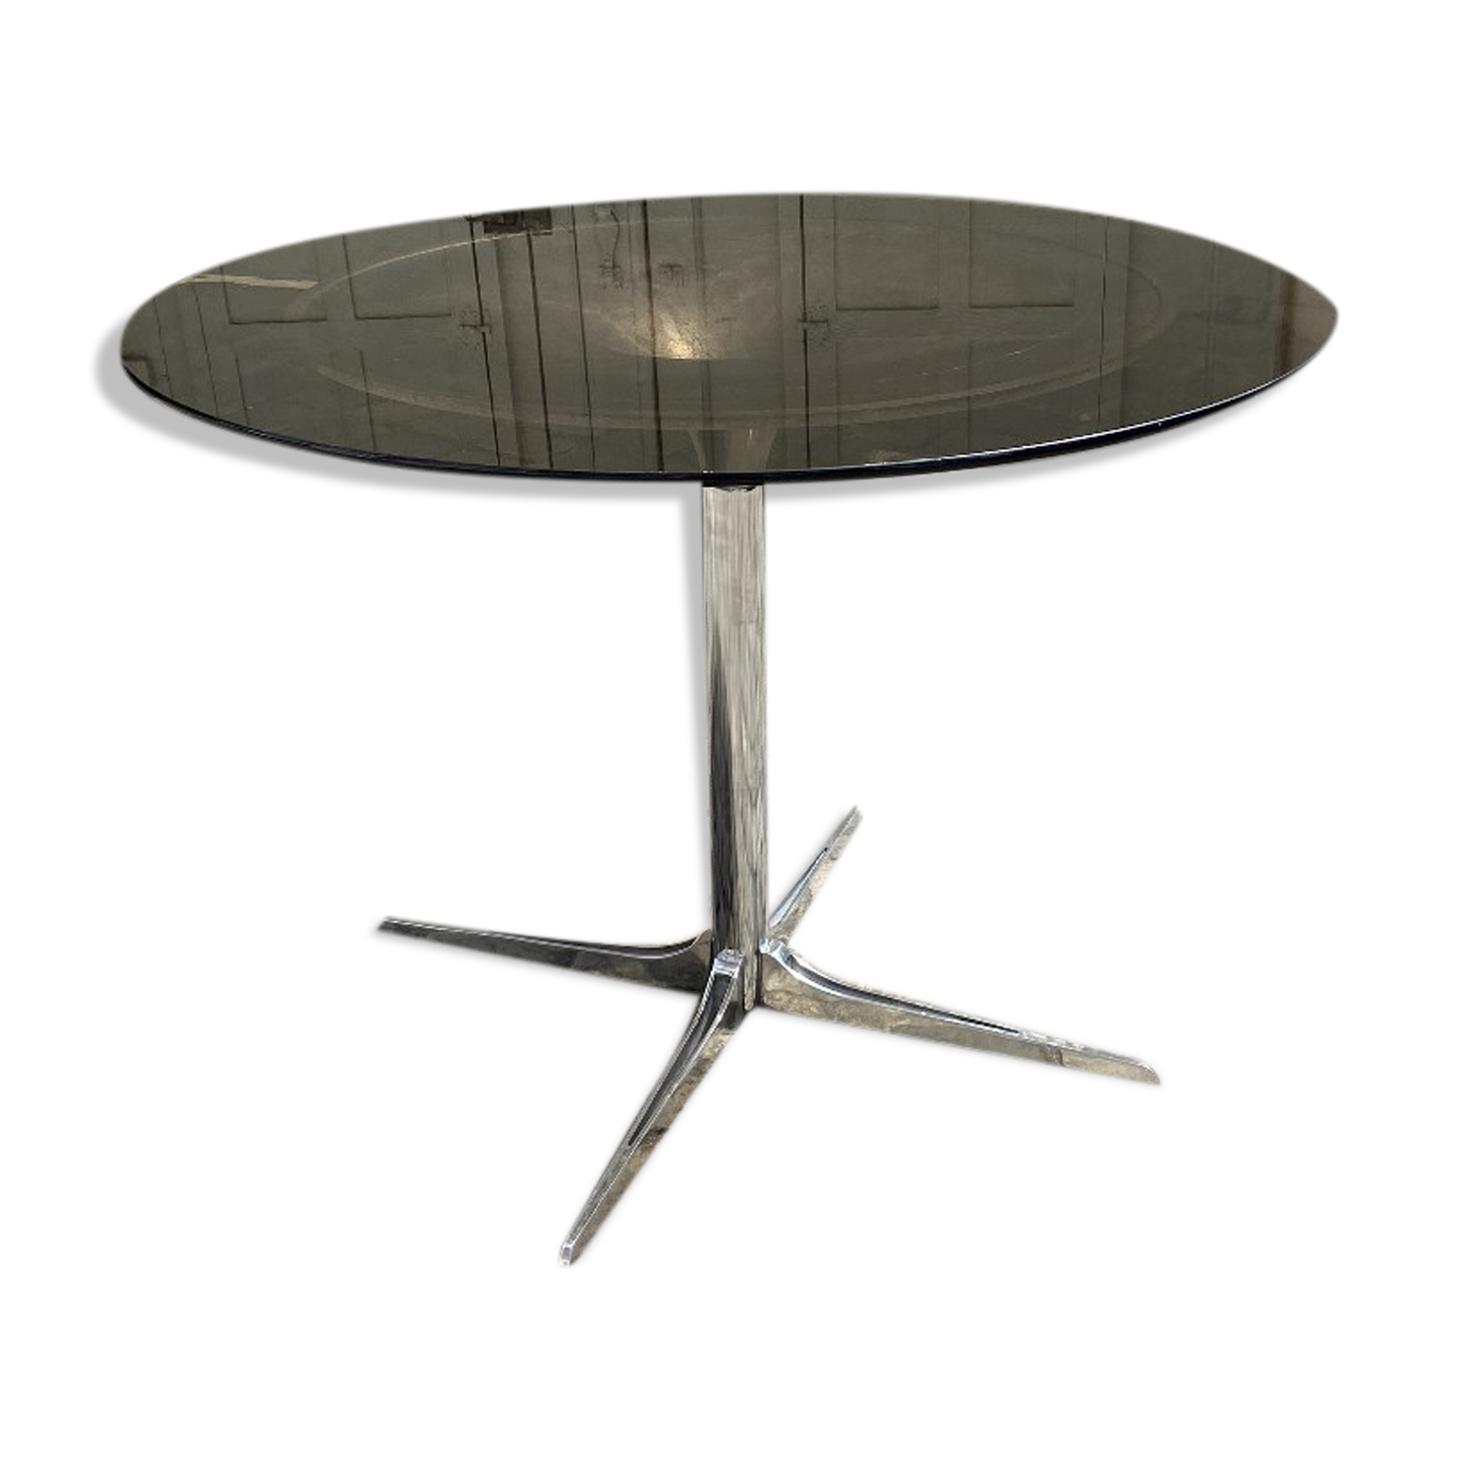 Table verre fumé italienne métal 1970